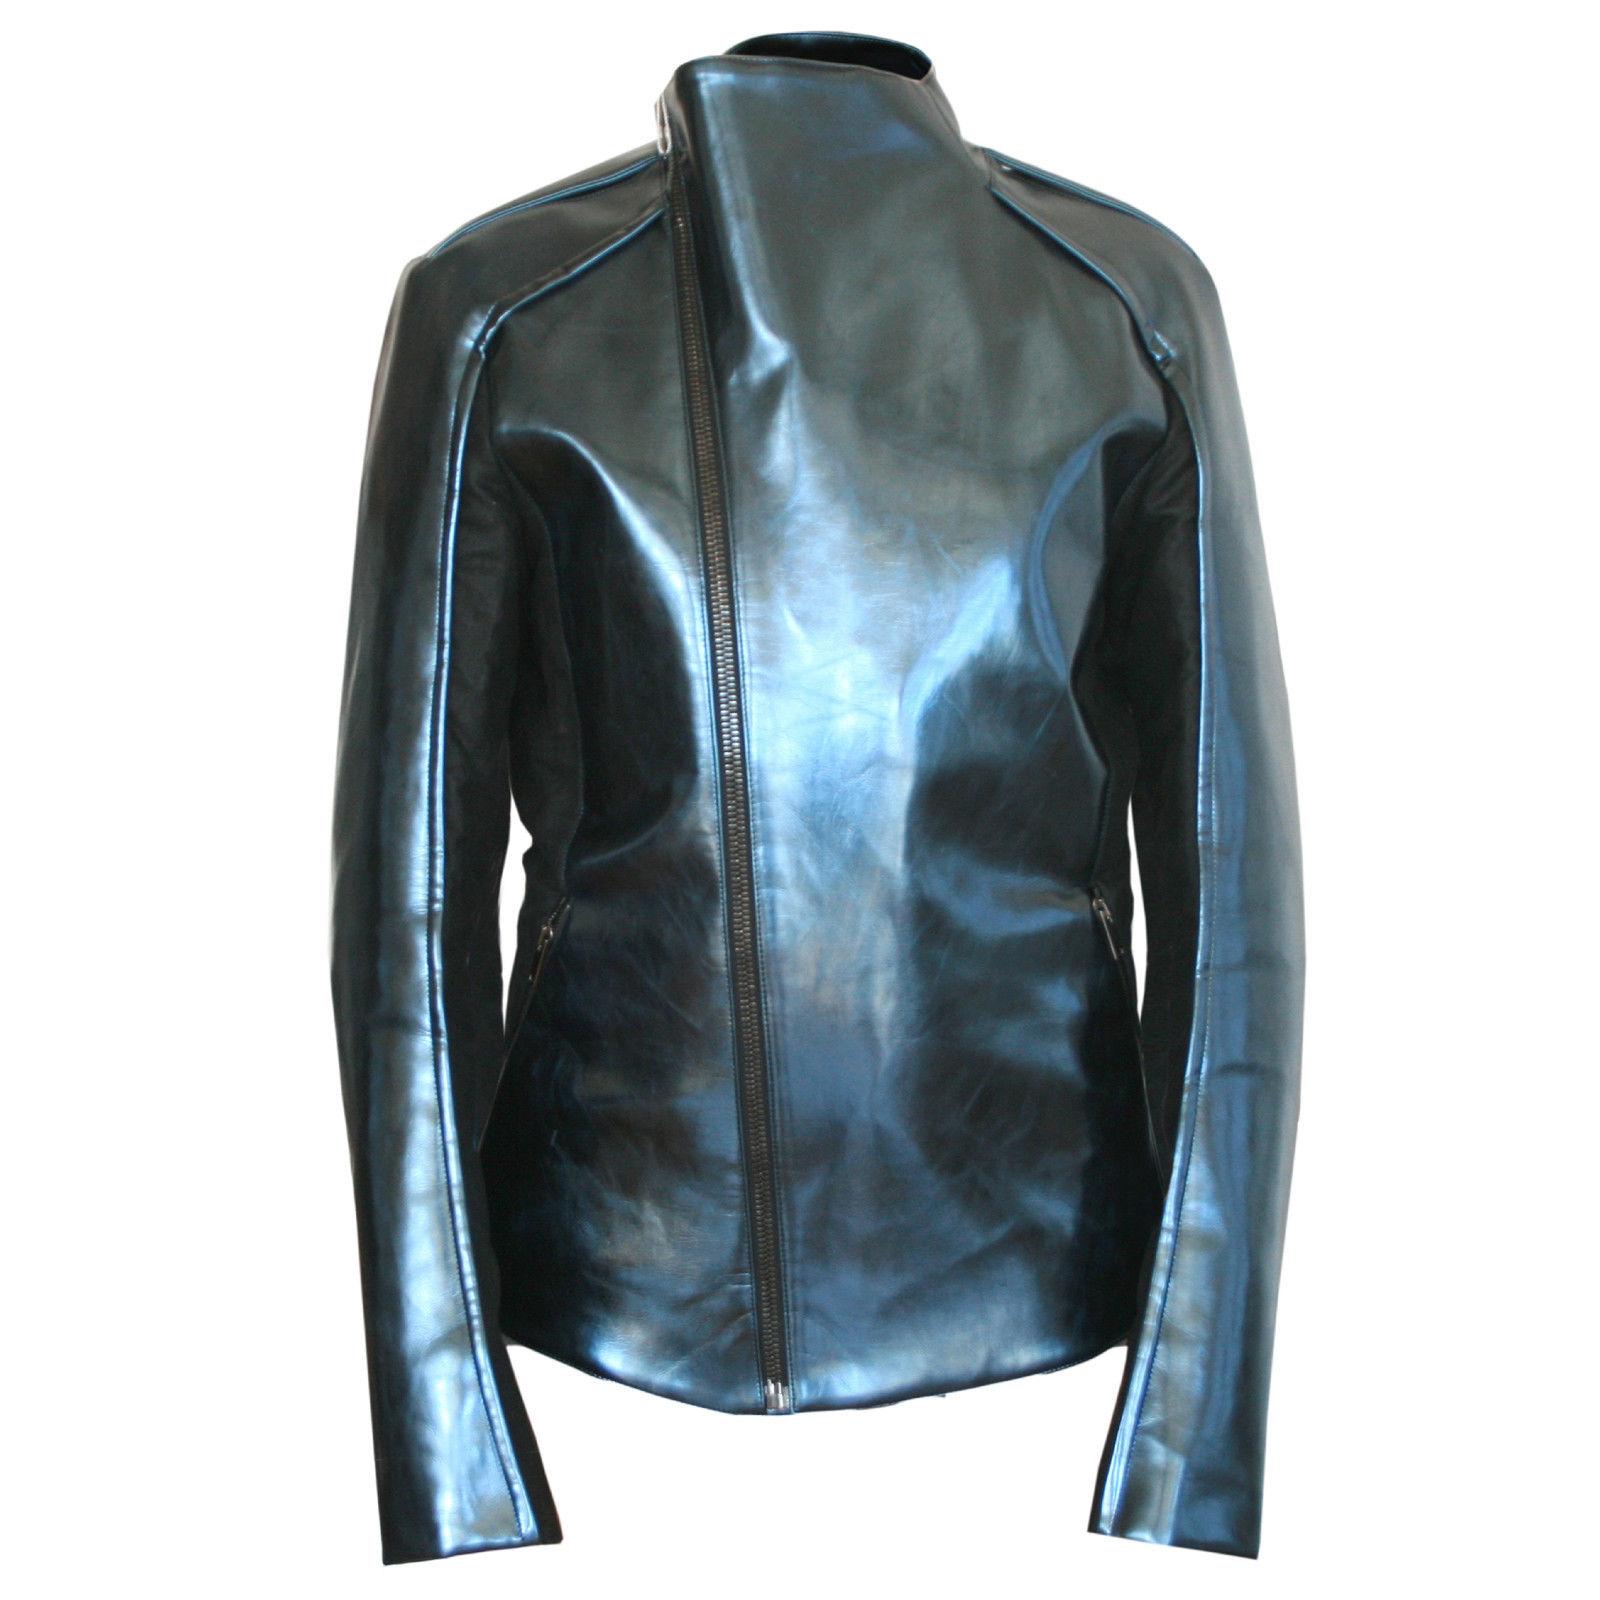 http://stores.ebay.com/thecoutureauctionco?_trksid=p2047675.l2563